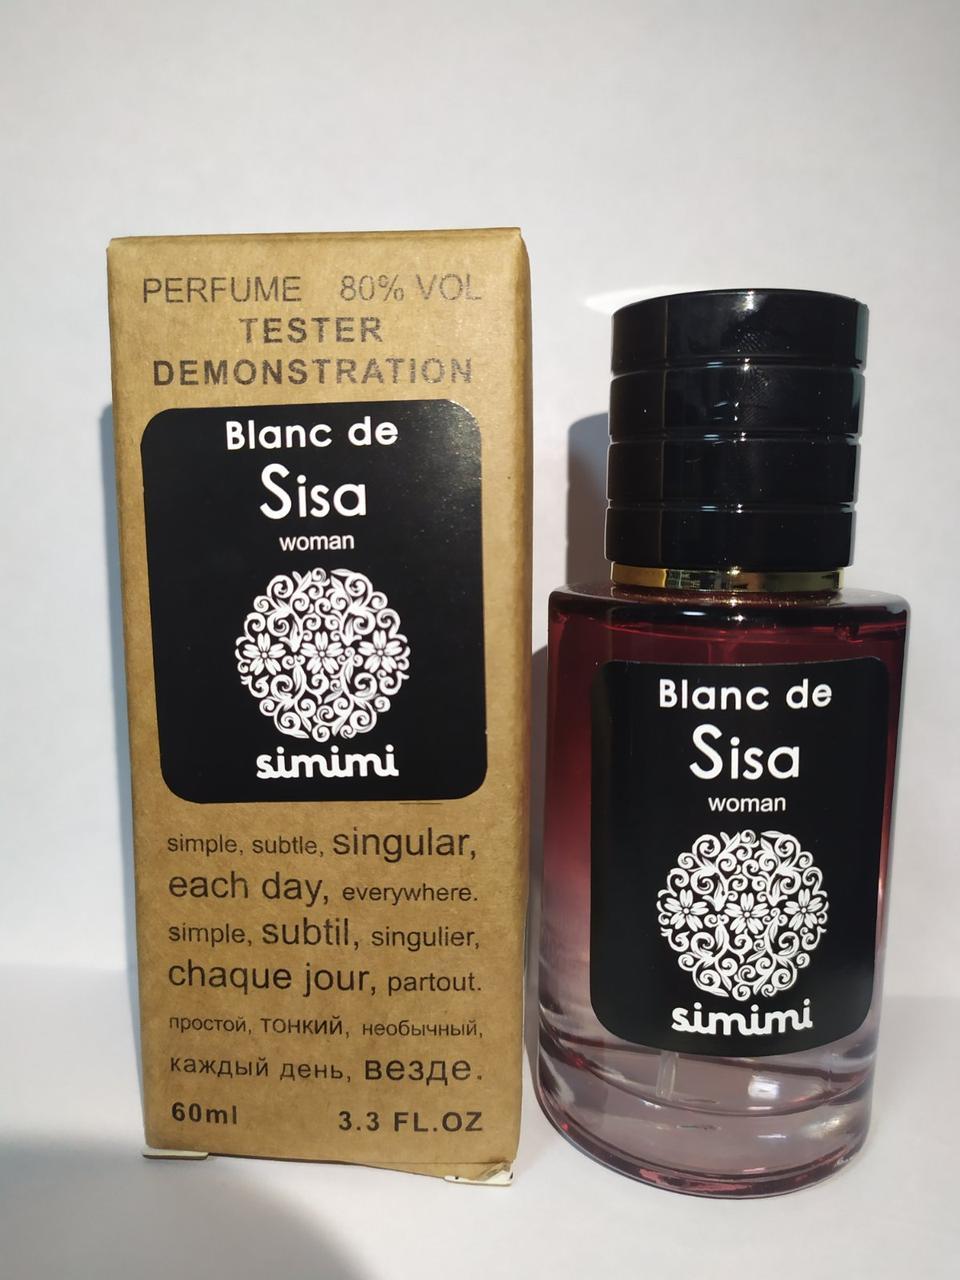 Тестер женский Simimi Blanc de Sisa 60 мл